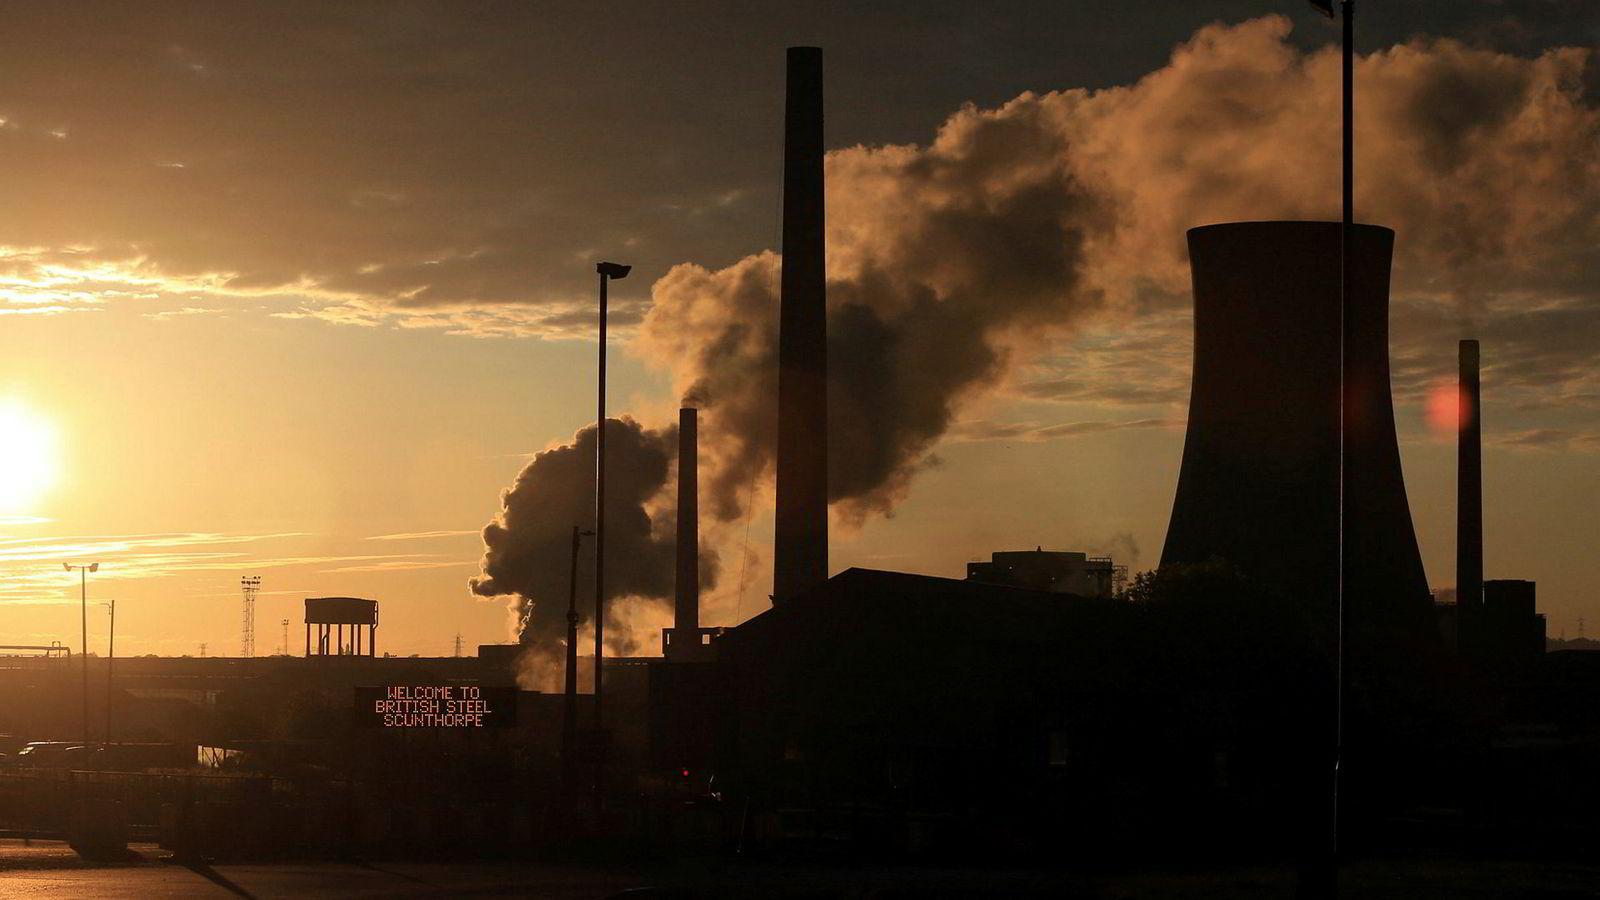 Scunthorpe-anlegget til British Steel i Storbritannia.